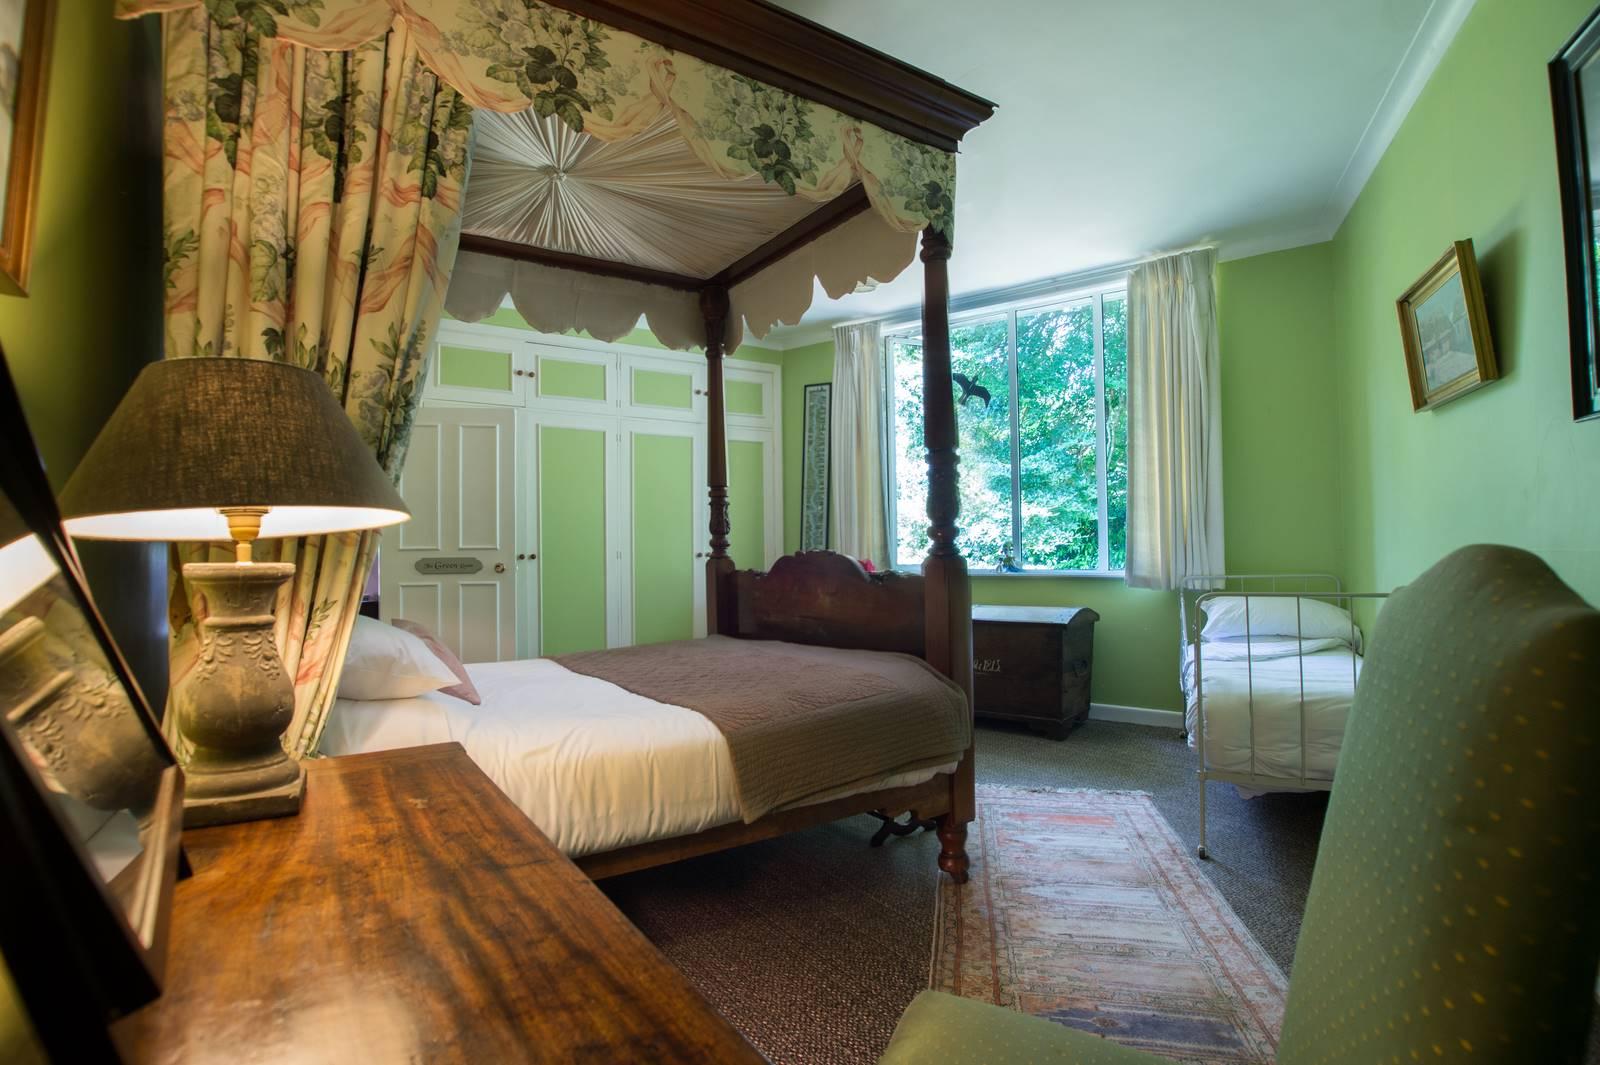 green_room_2